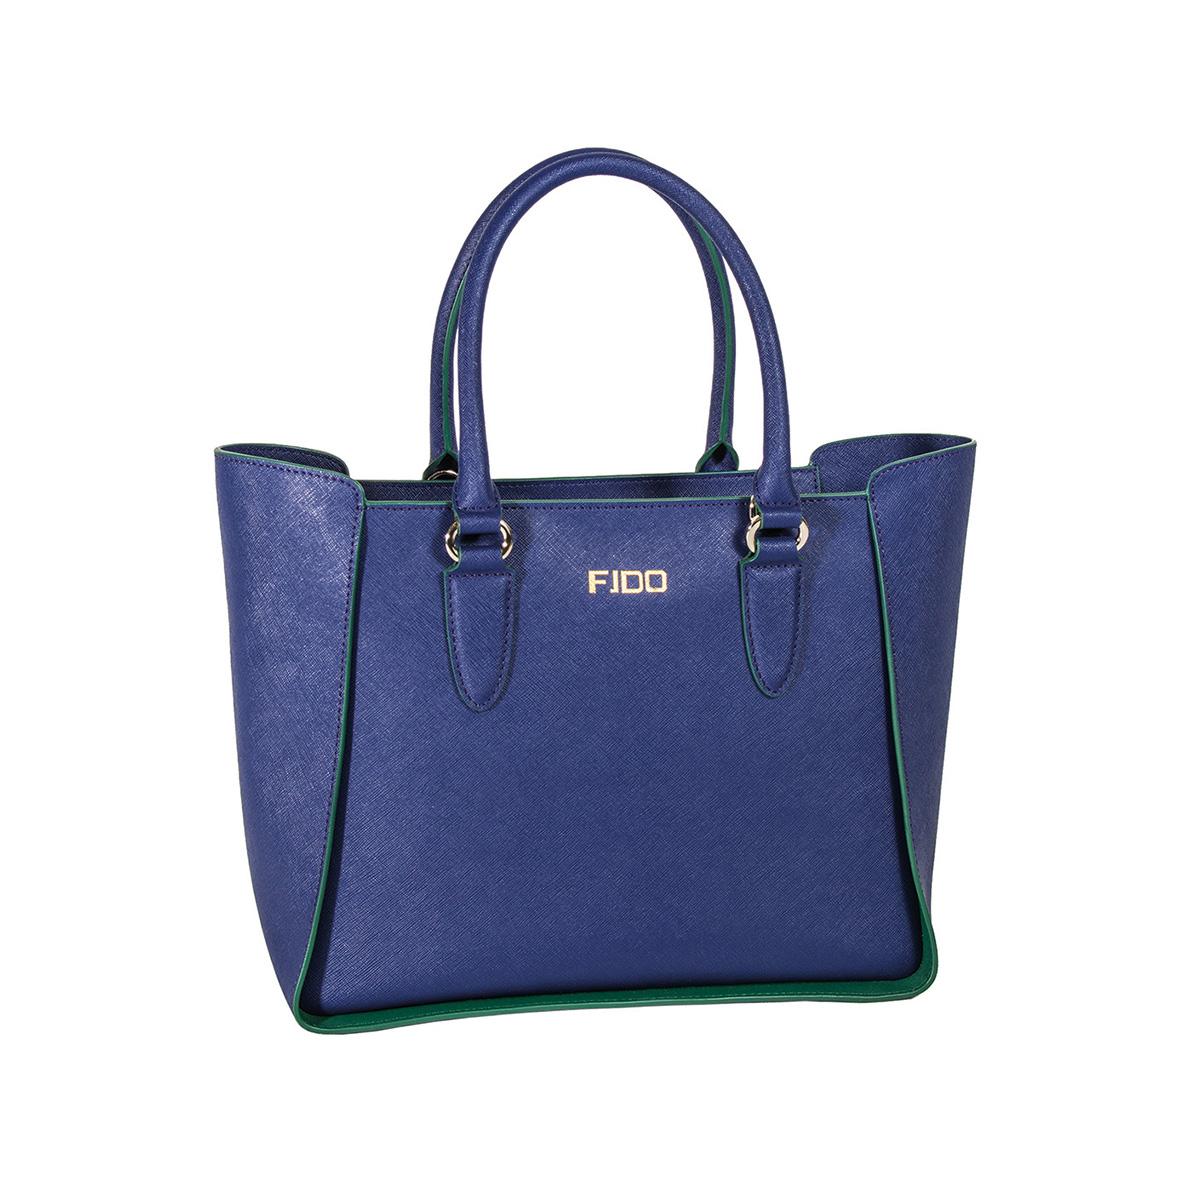 7b9ee8392d Προσφορά Δερμάτινη Τσάντα Χειρός-Tote Λεοπάρ Νεσεσέρ Fido 44-29 Μπλε ...